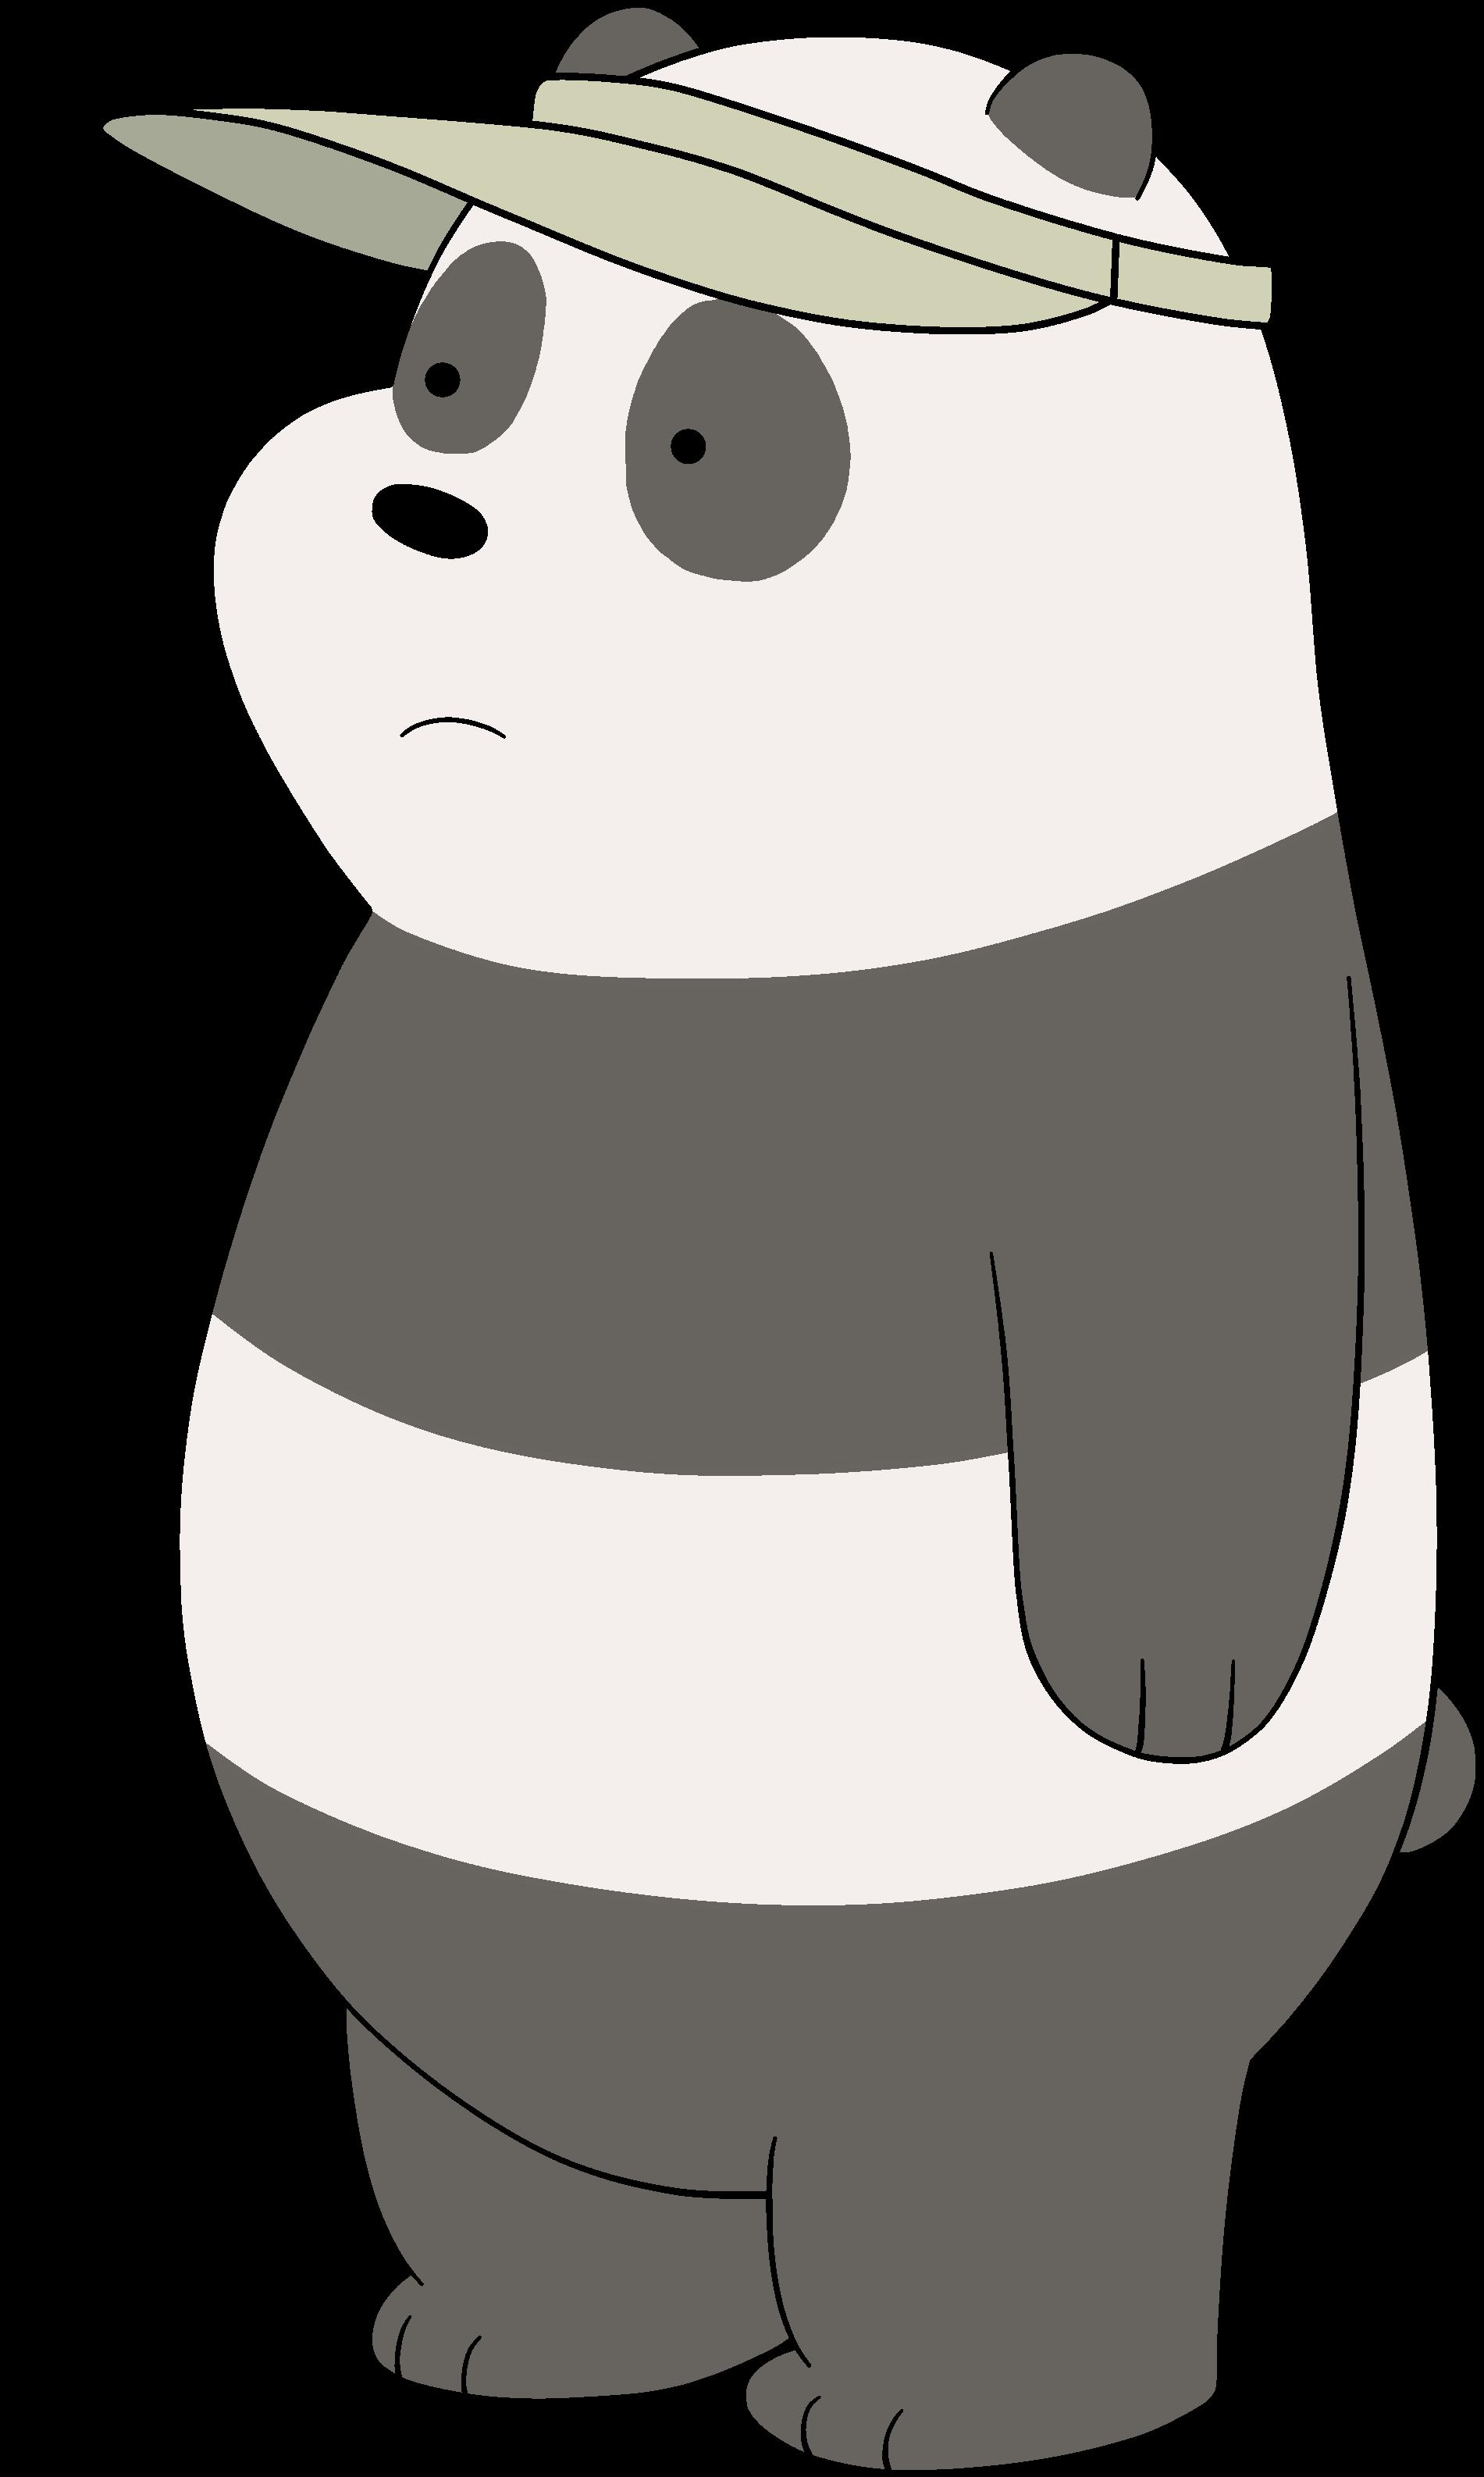 Panda Clipart We Bare Bears Panda We Bare Bears Transparent